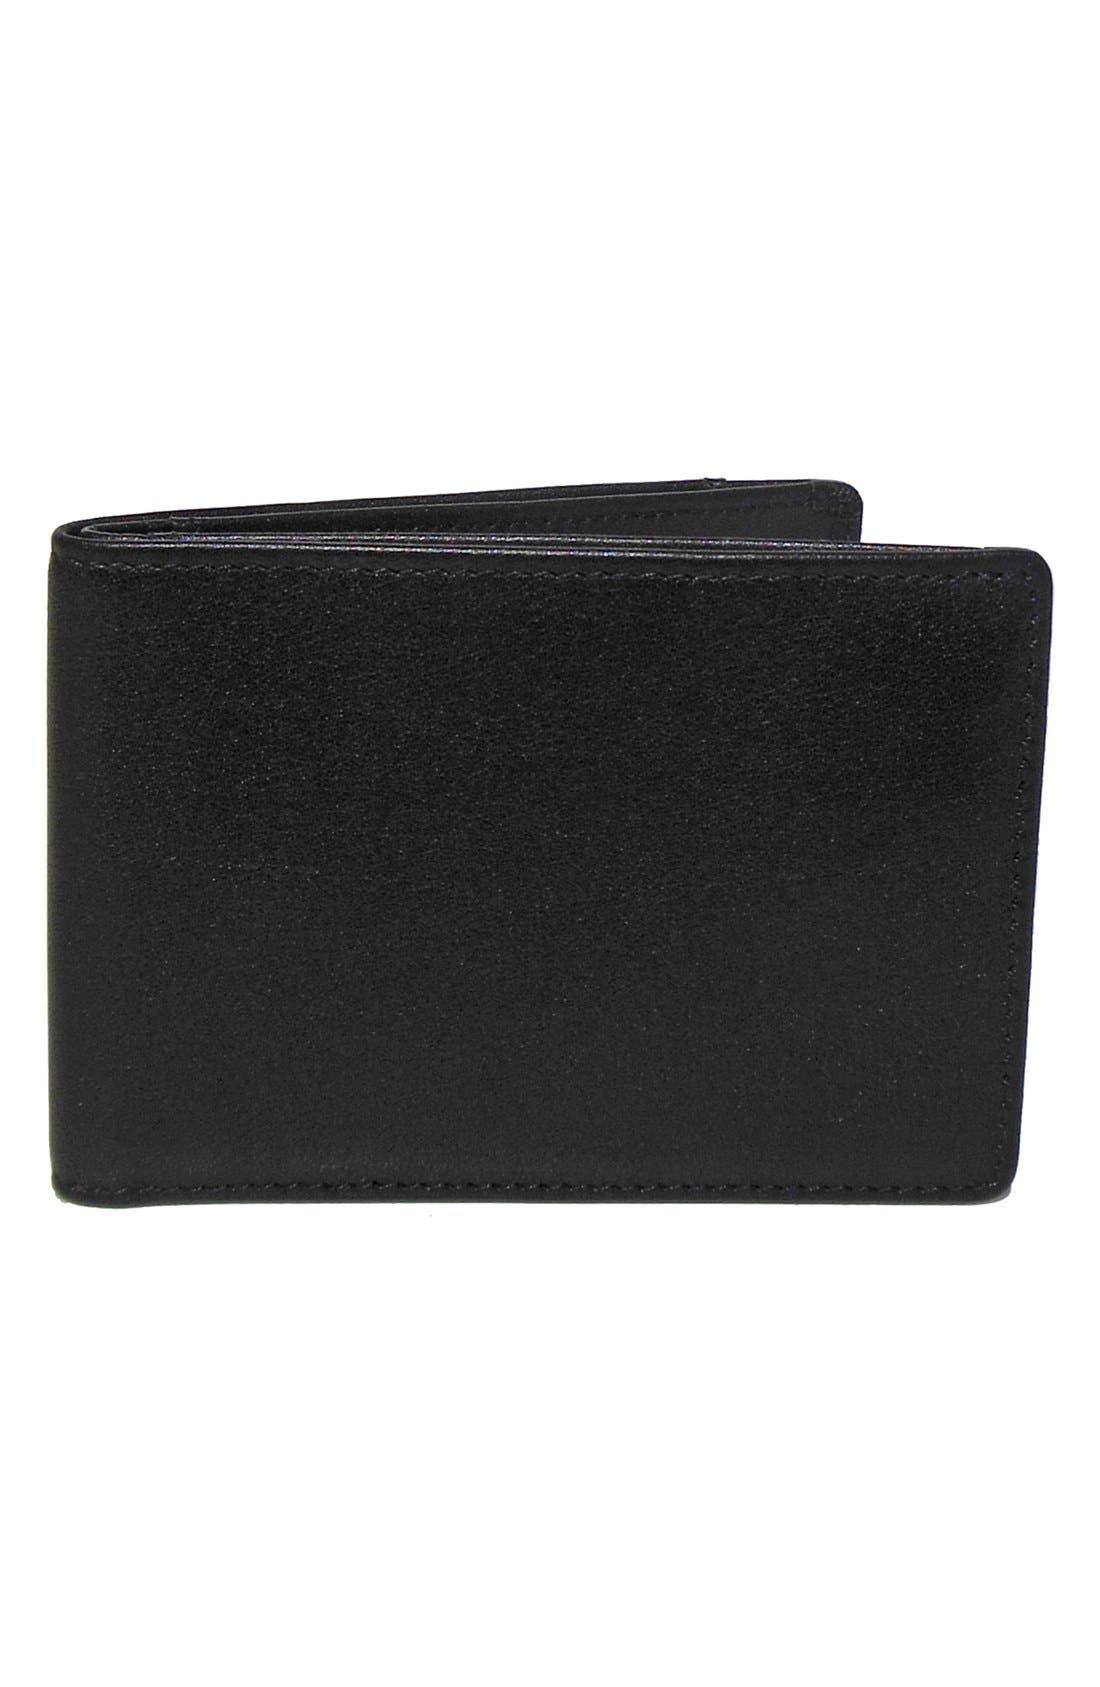 Boconi 'Grant Slimster' RFID Blocker Leather Wallet